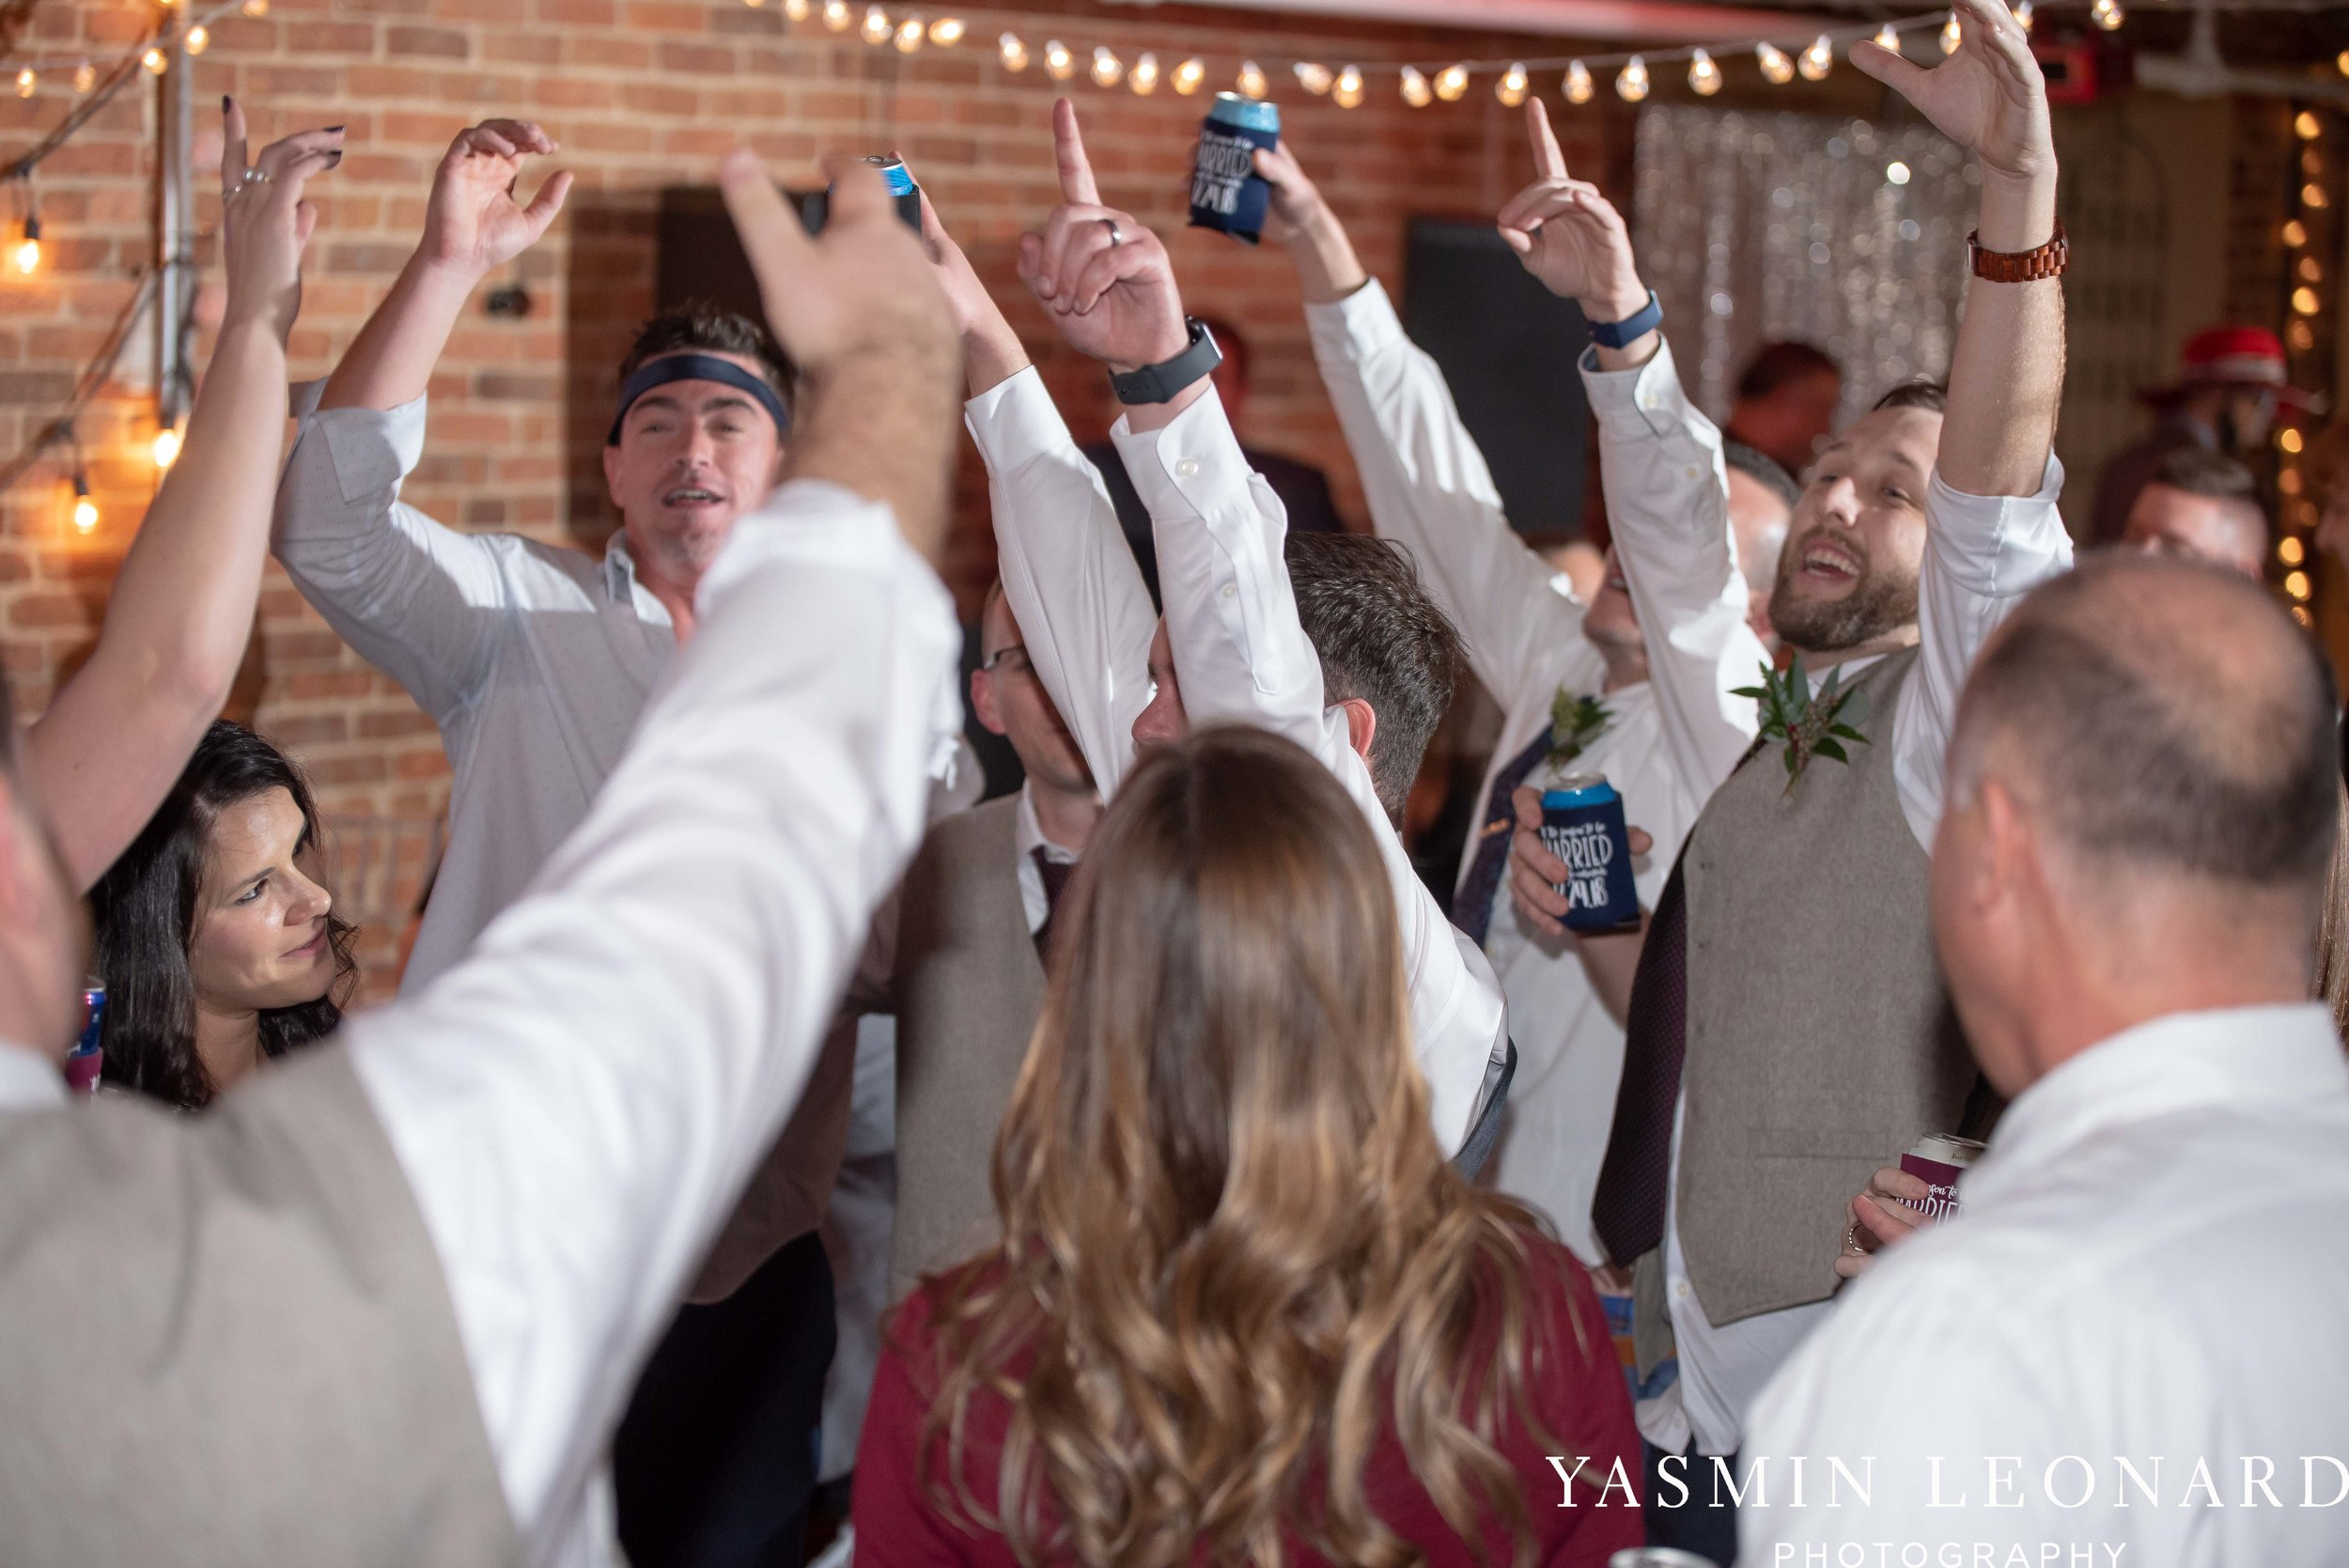 Rebekah and Matt - 105 Worth Event Centre - Yasmin Leonard Photography - Asheboro Wedding - NC Wedding - High Point Weddings - Triad Weddings - Winter Wedding-62.jpg